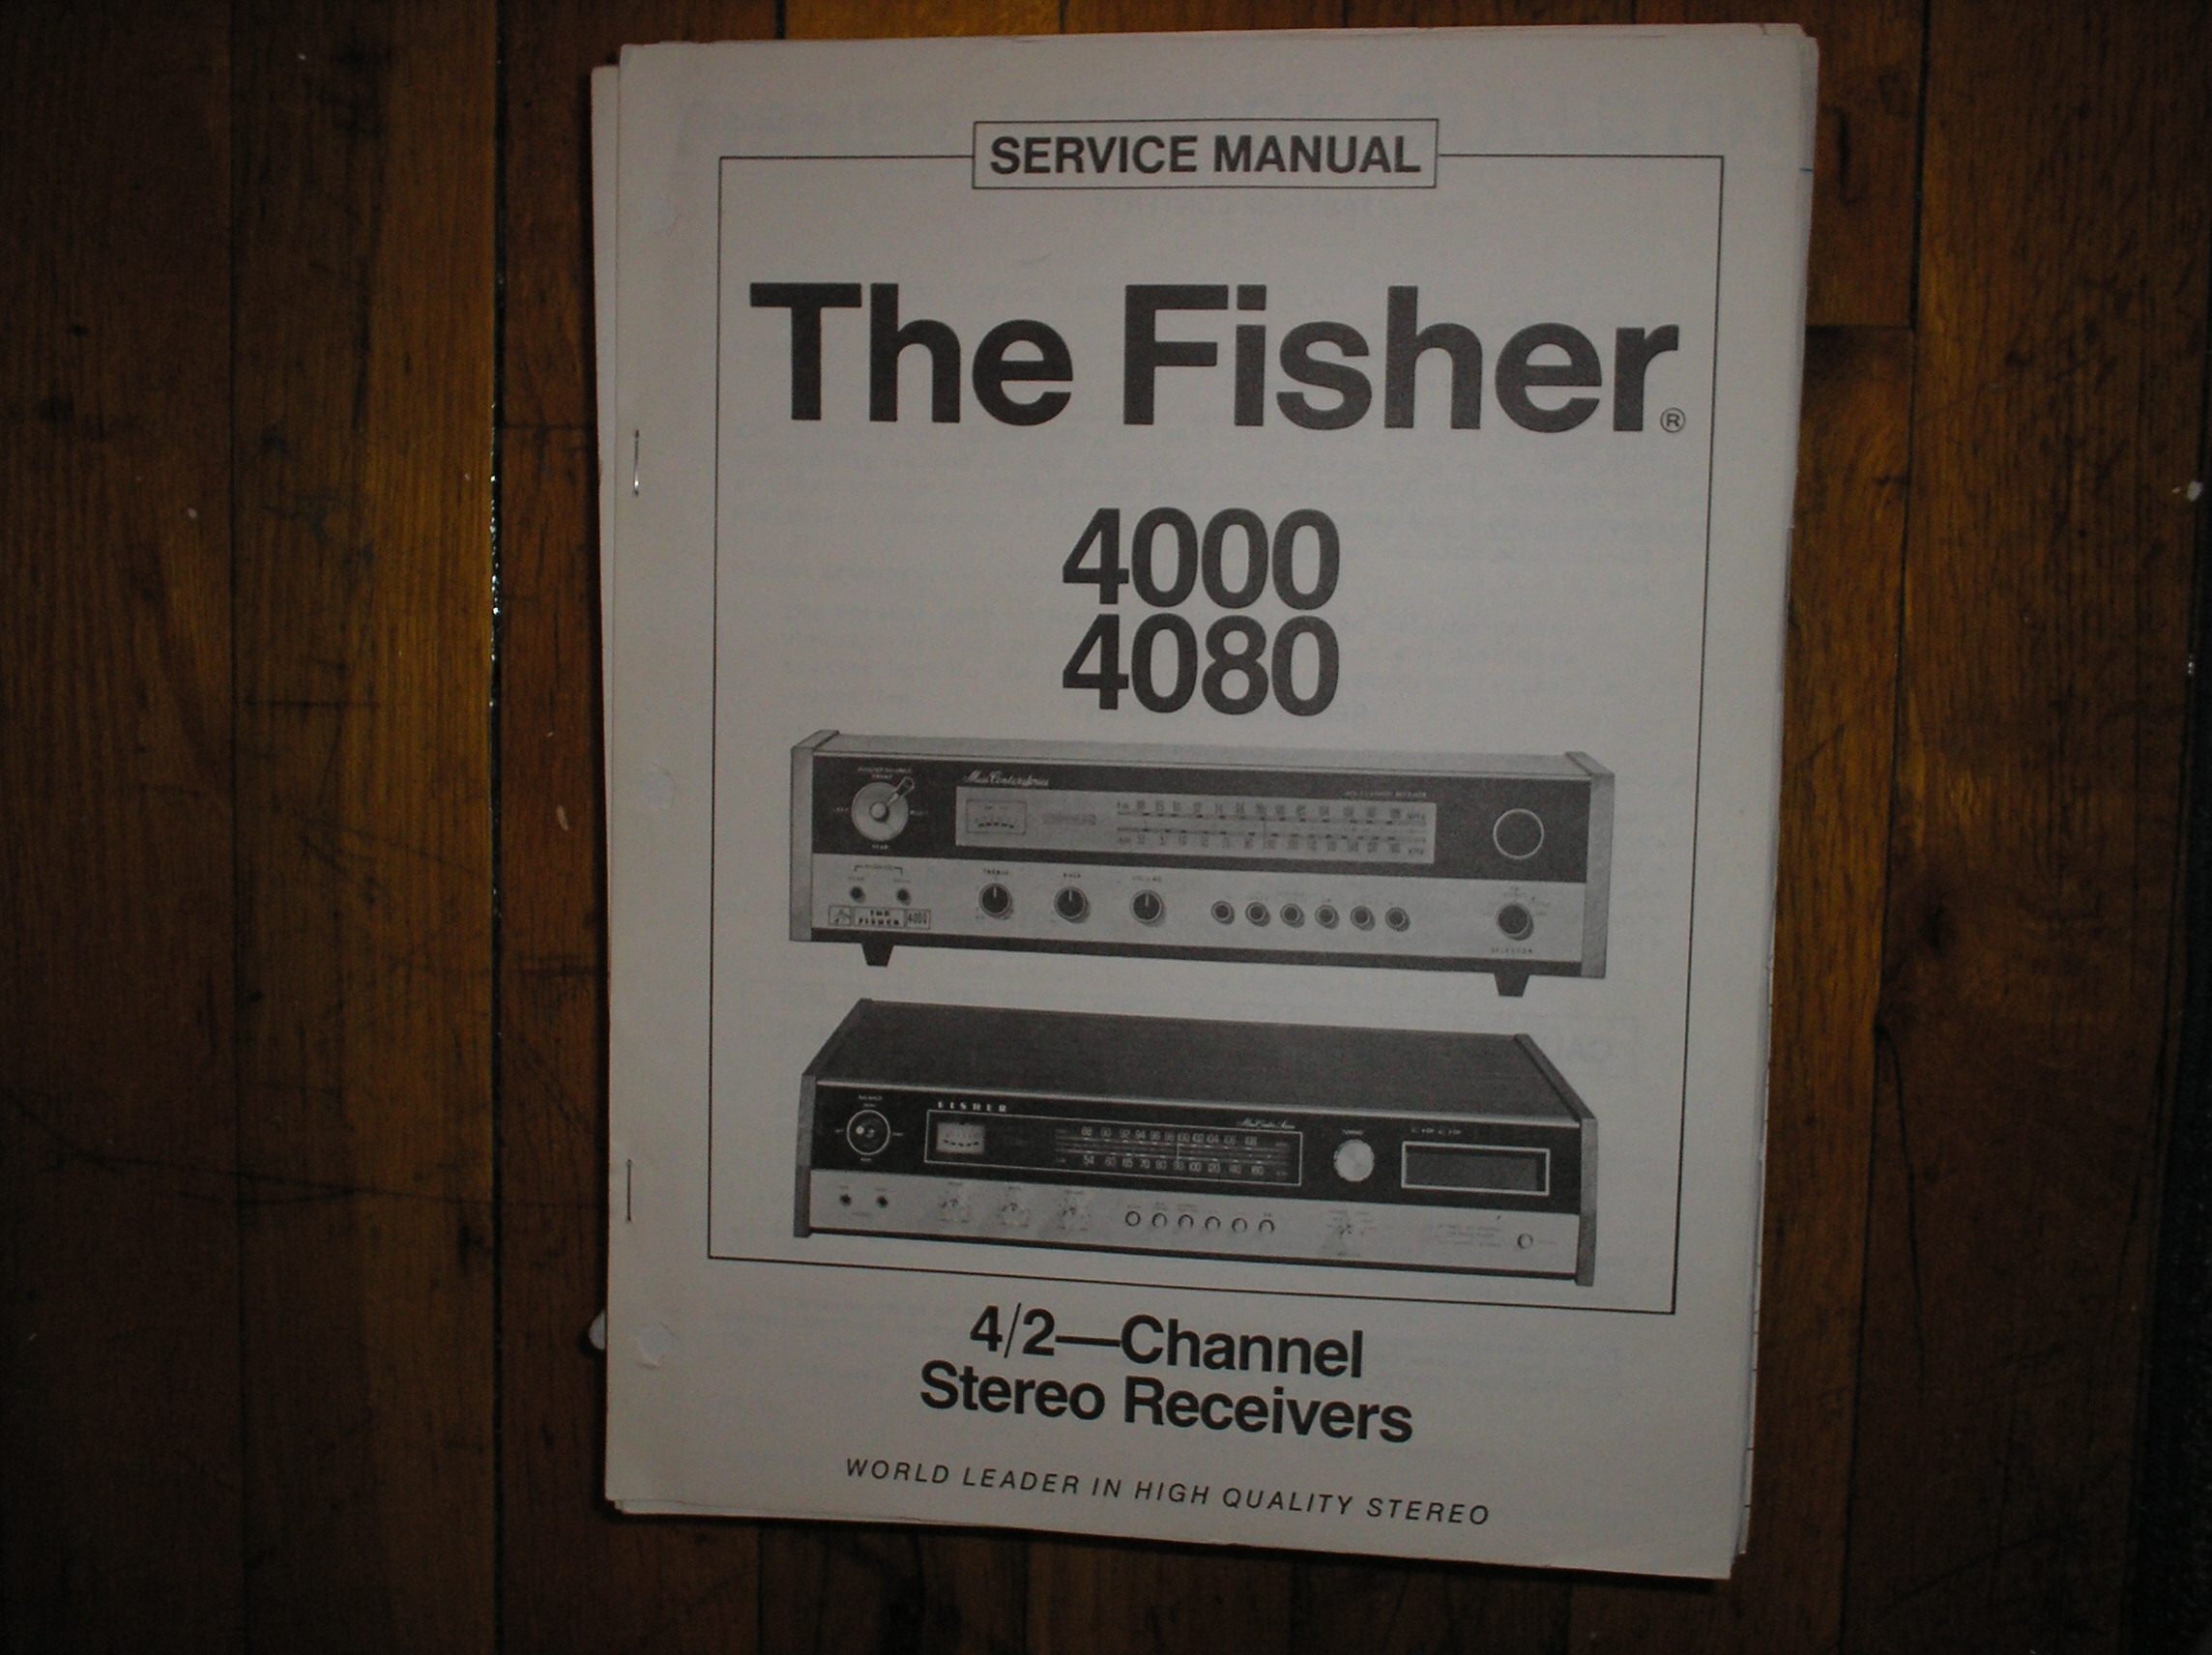 4000 4080 Receiver Service Manual